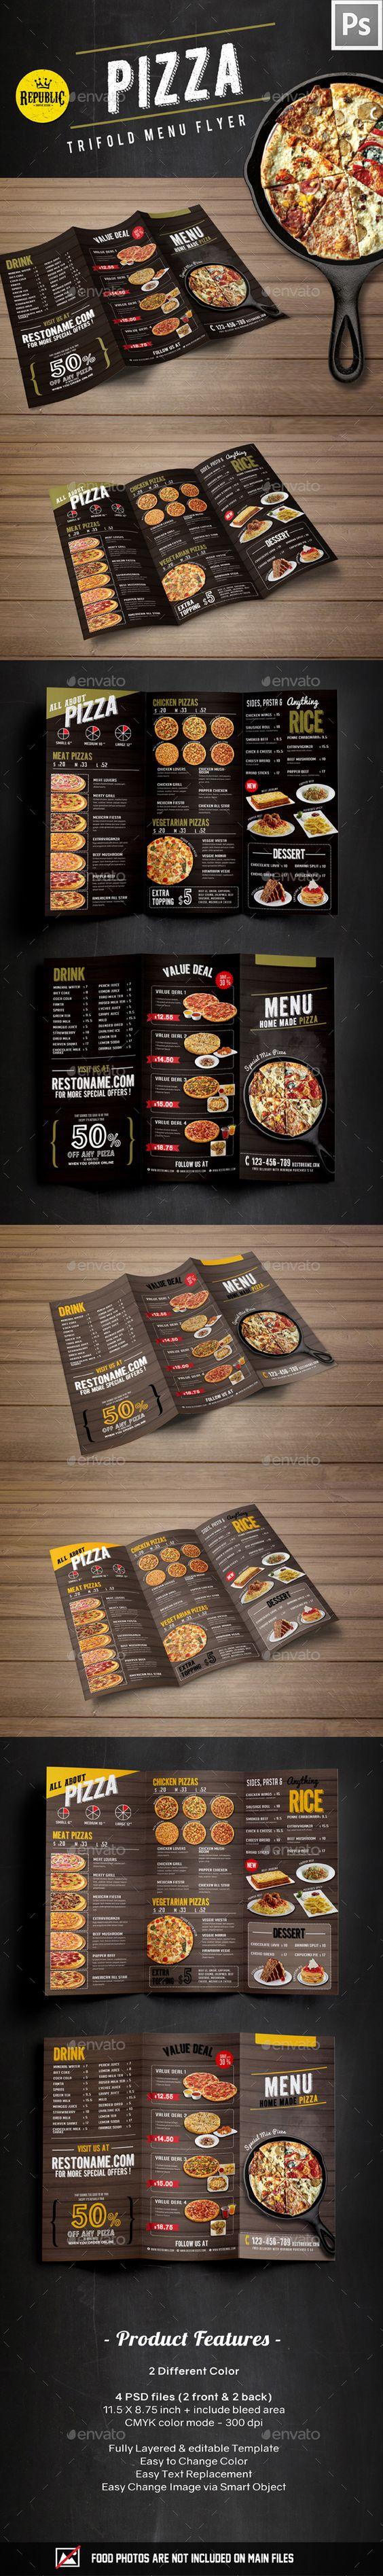 Trifold Pizza Menu Template PSD. Download here: http://graphicriver.net/item/trifold-pizza-menu/15646337?ref=ksioks